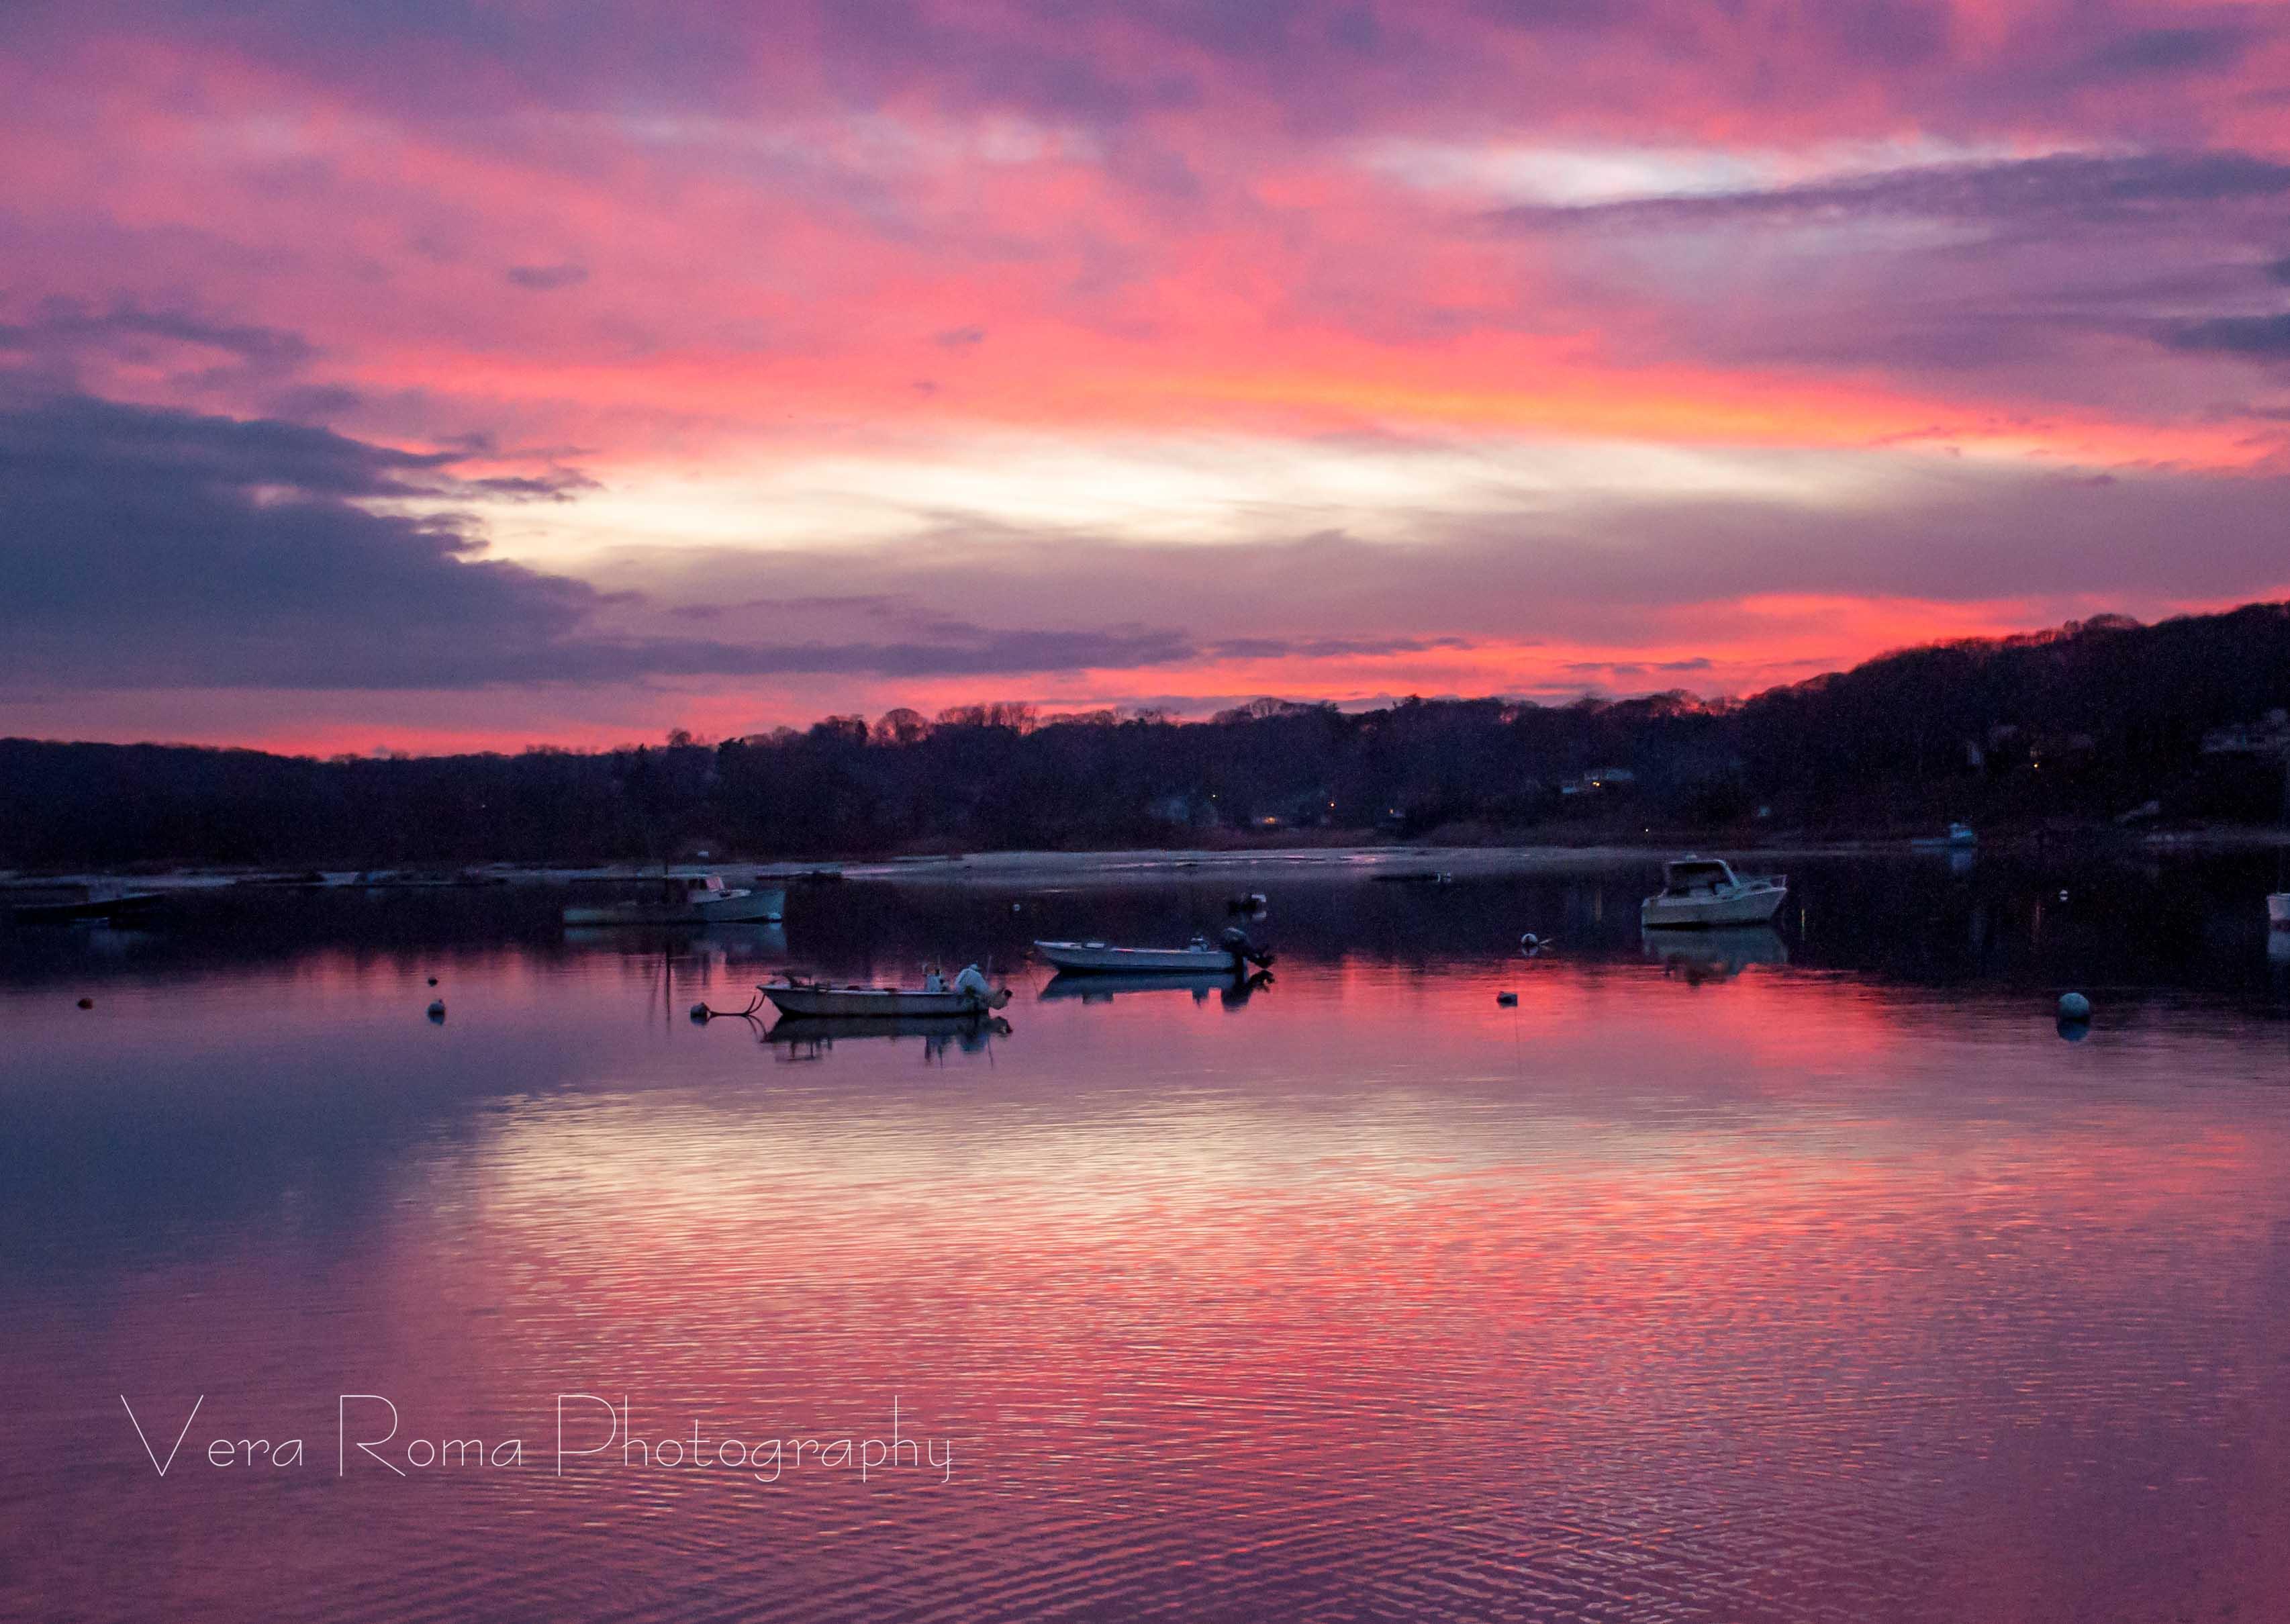 Northport-Dec'15 Sunsets & Lights-22